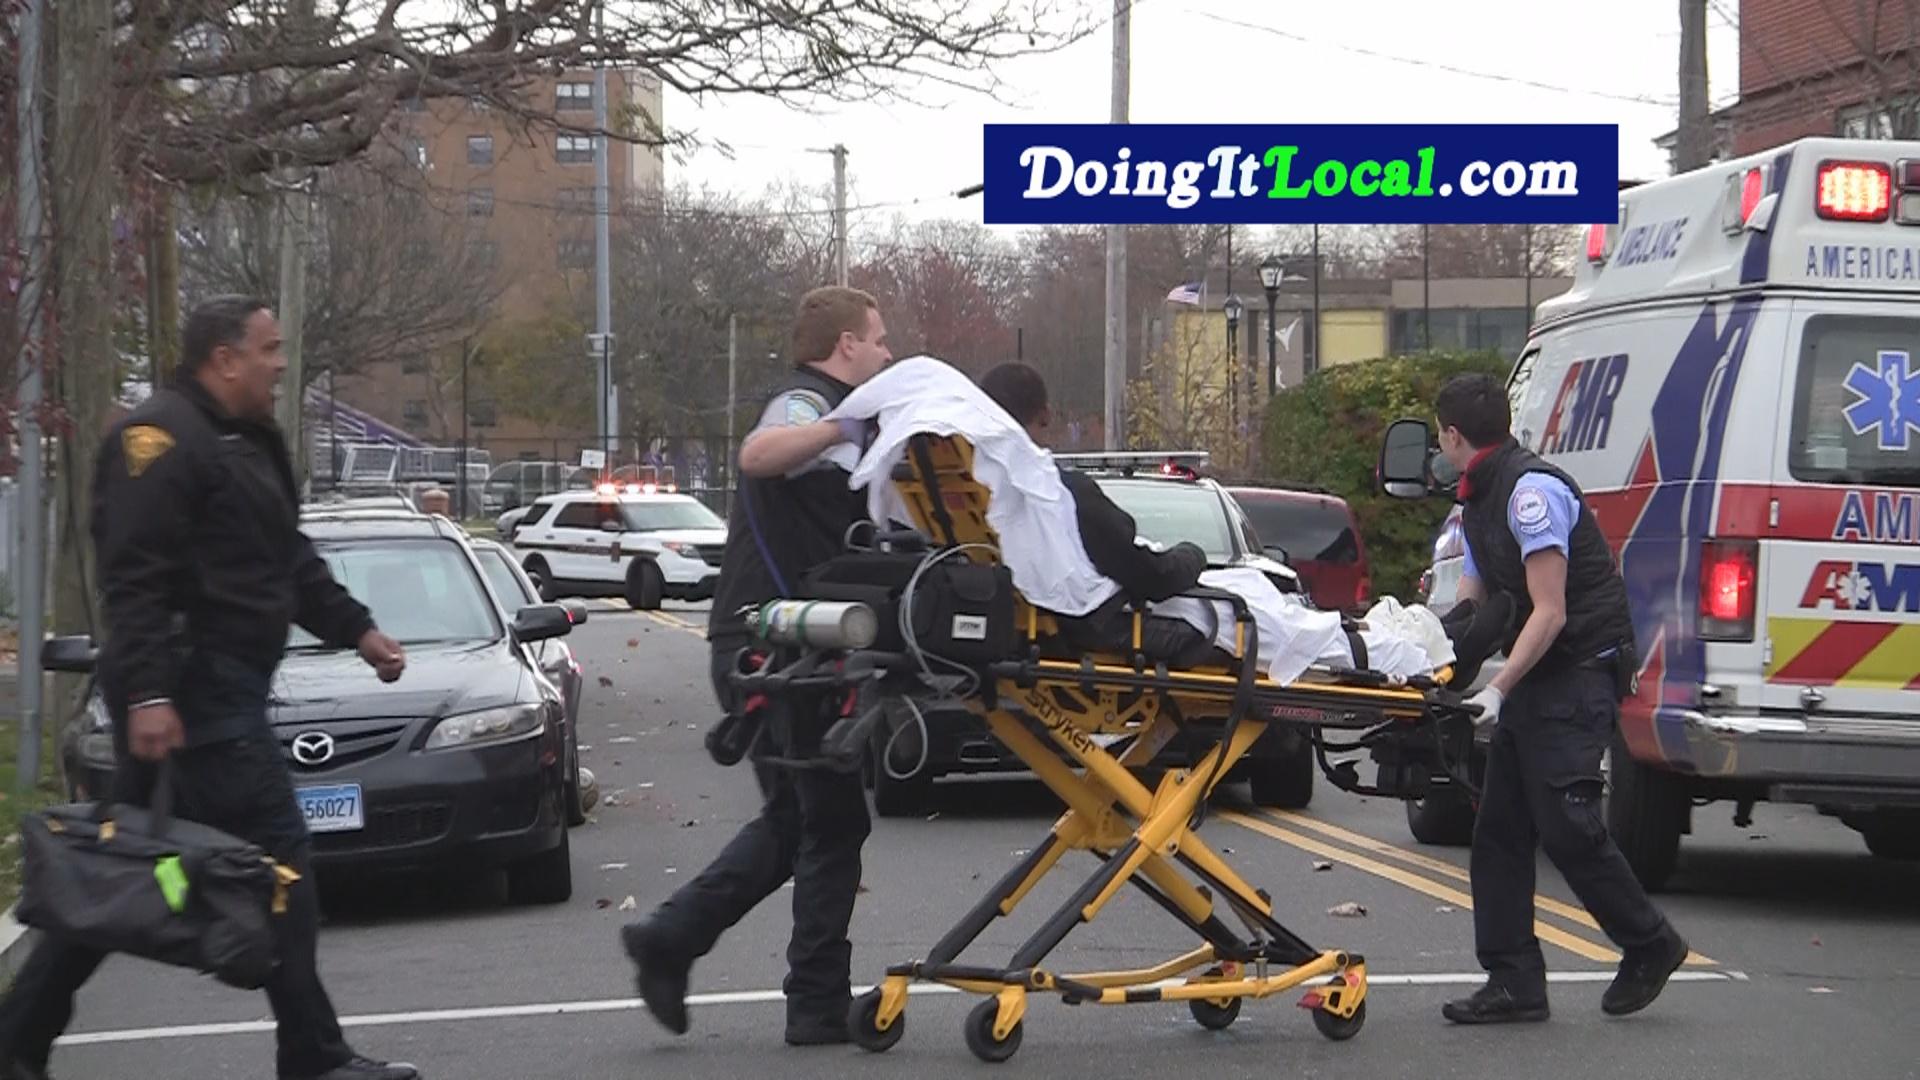 Bridgeport News: 15 Year Old Shot